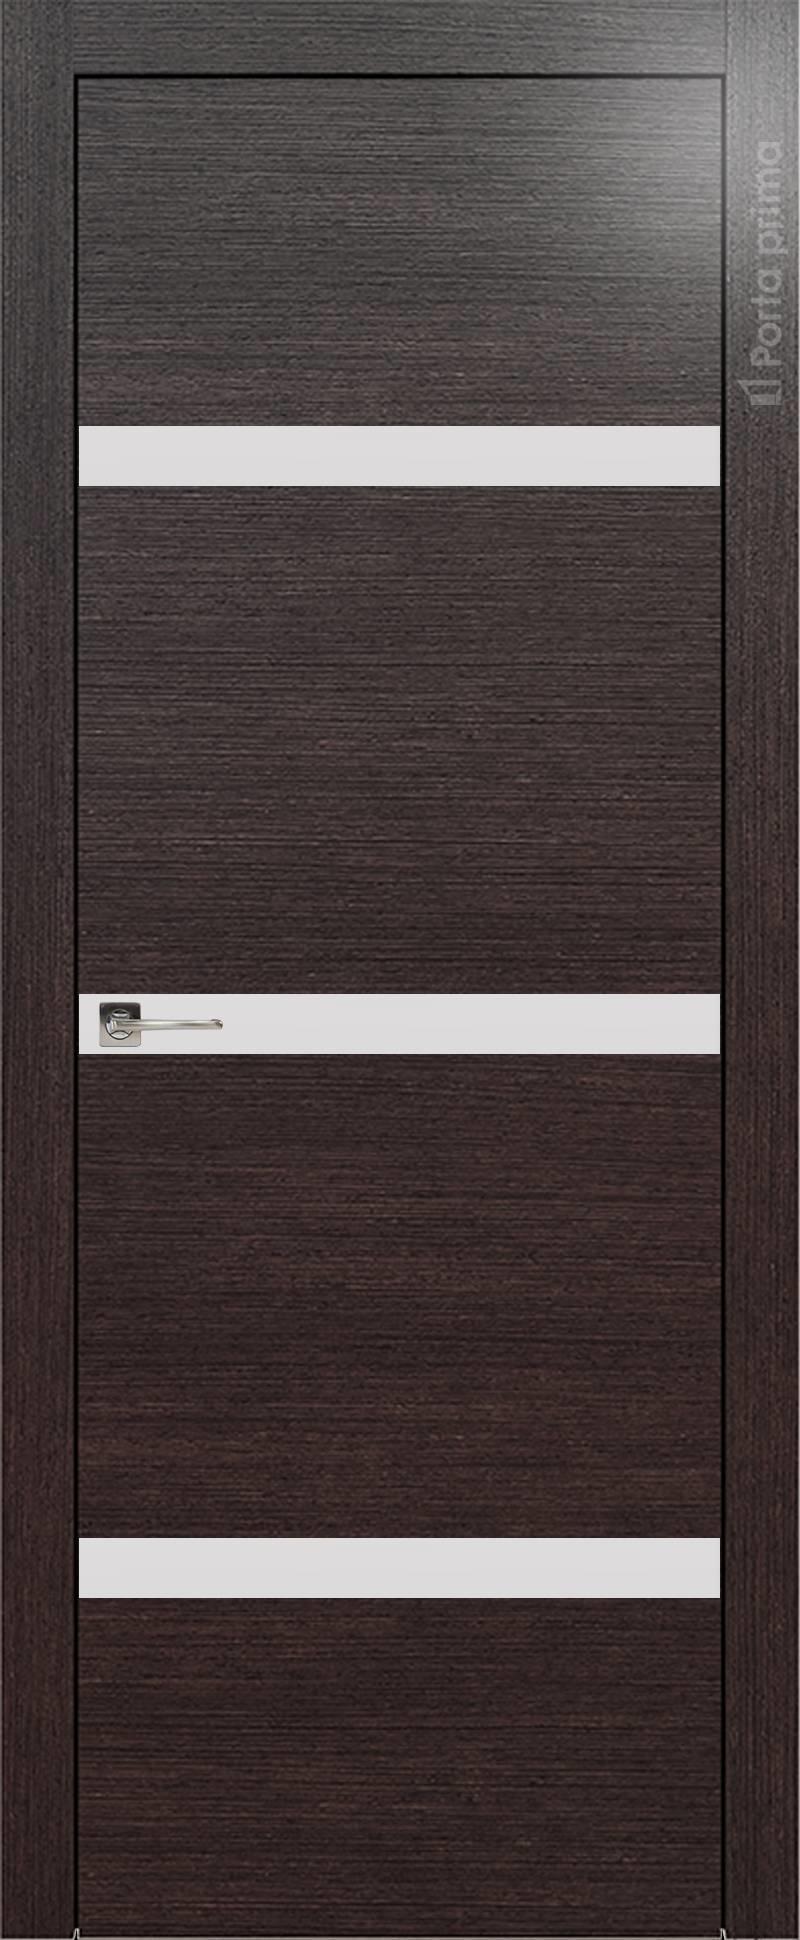 Tivoli Г-4 цвет - Венге Шоколад Без стекла (ДГ)